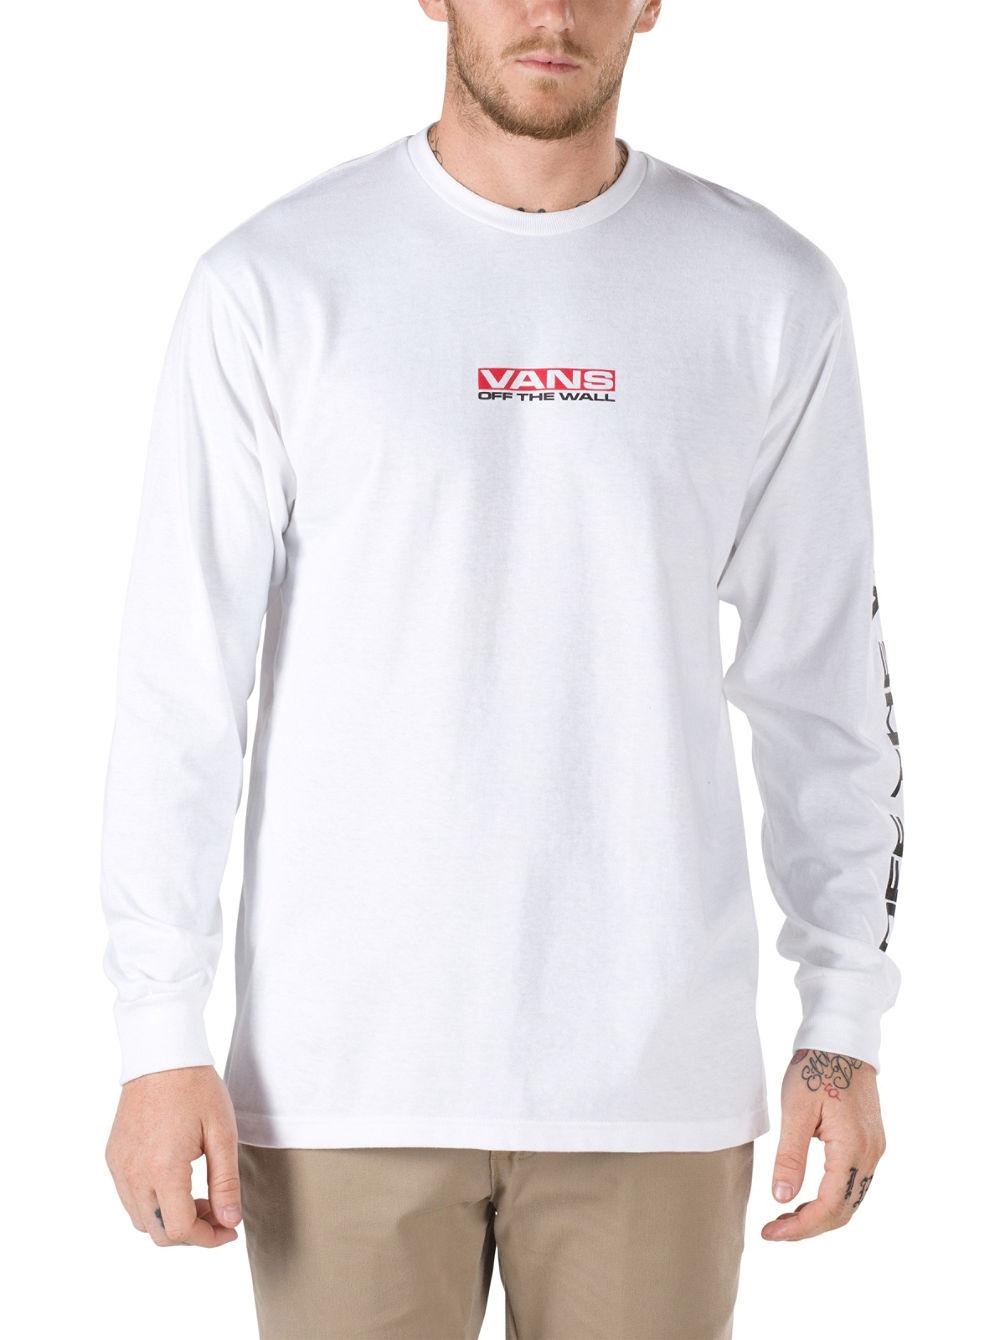 8566874ed4 Buy Vans Side Waze Long Sleeve T-Shirt online at Blue Tomato